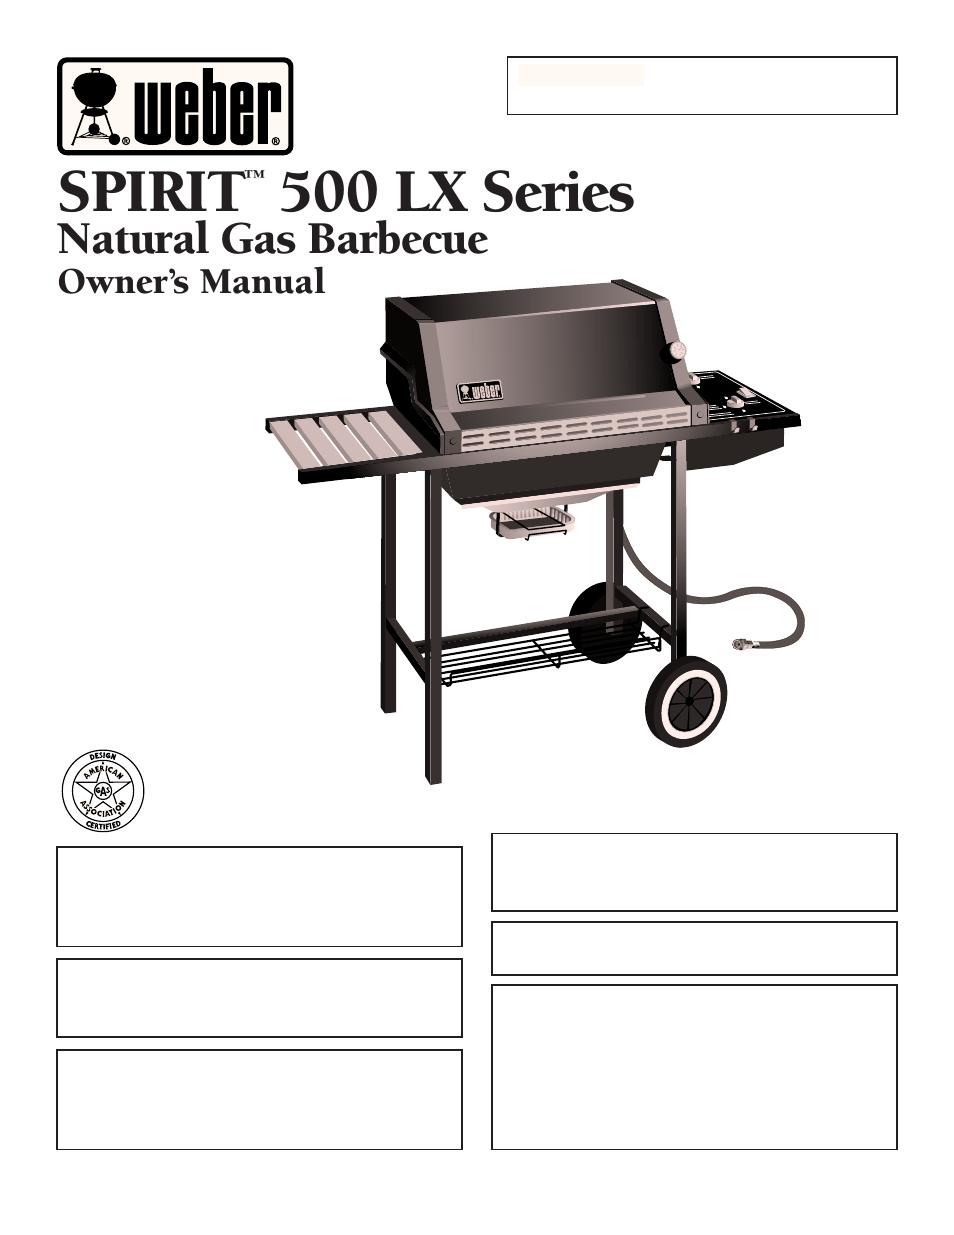 weber SPIRIT 500 LX User Manual | 32 pages